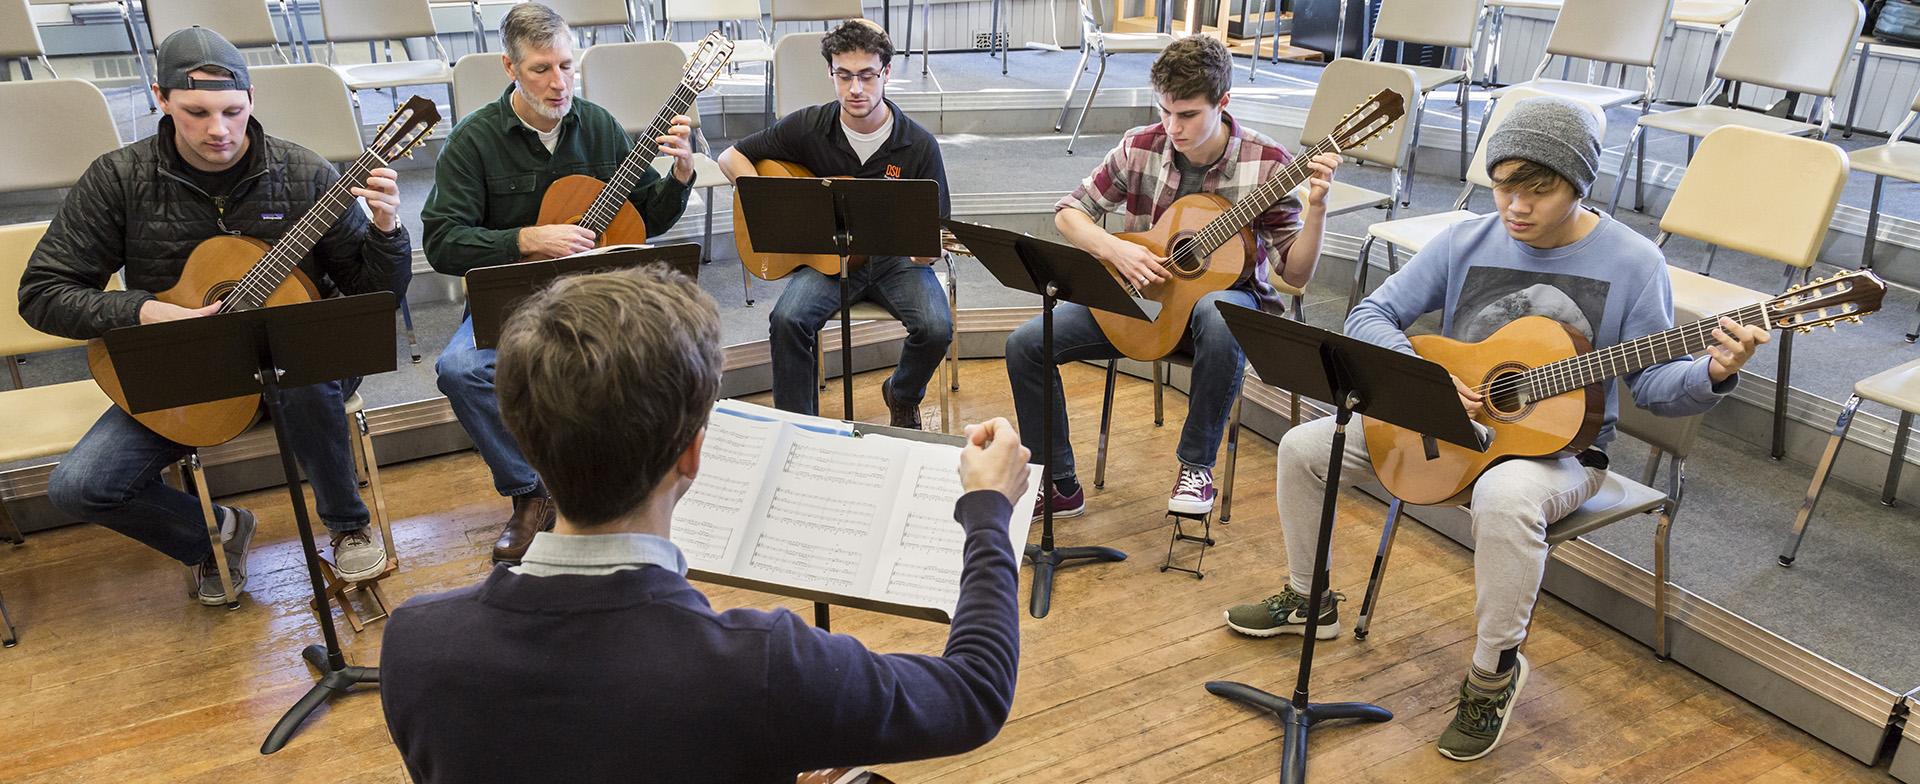 OSU guitar ensemble in rehearsal